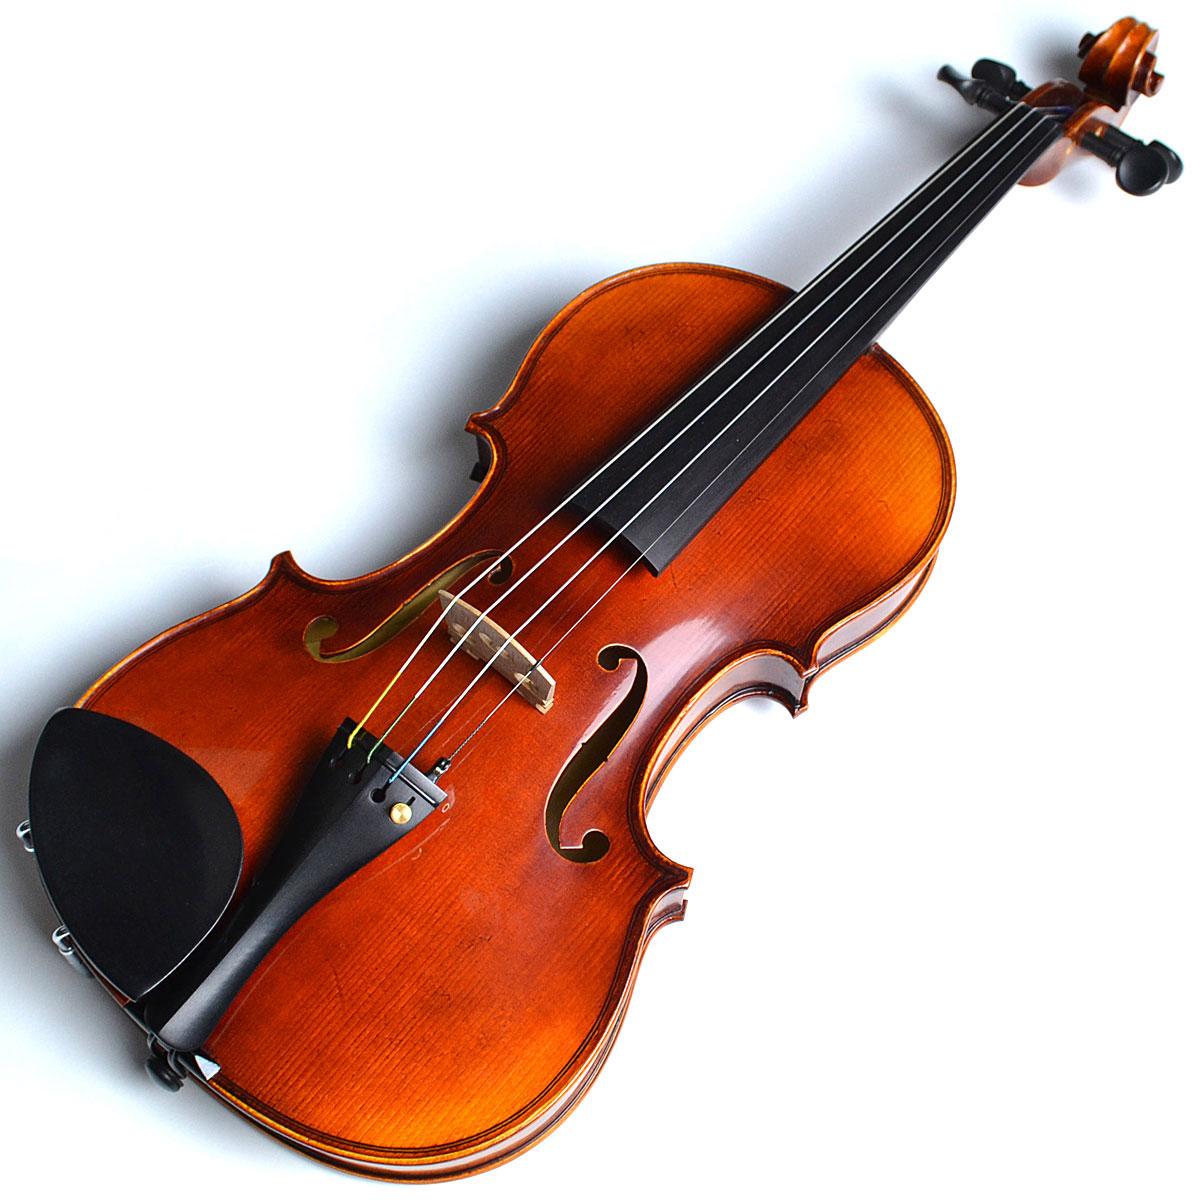 GEWA Meister II バイオリン セット 4/4サイズ ケースカラー:ブルー 【ゲバ マイスター II アウトフィット】【島村楽器限定】